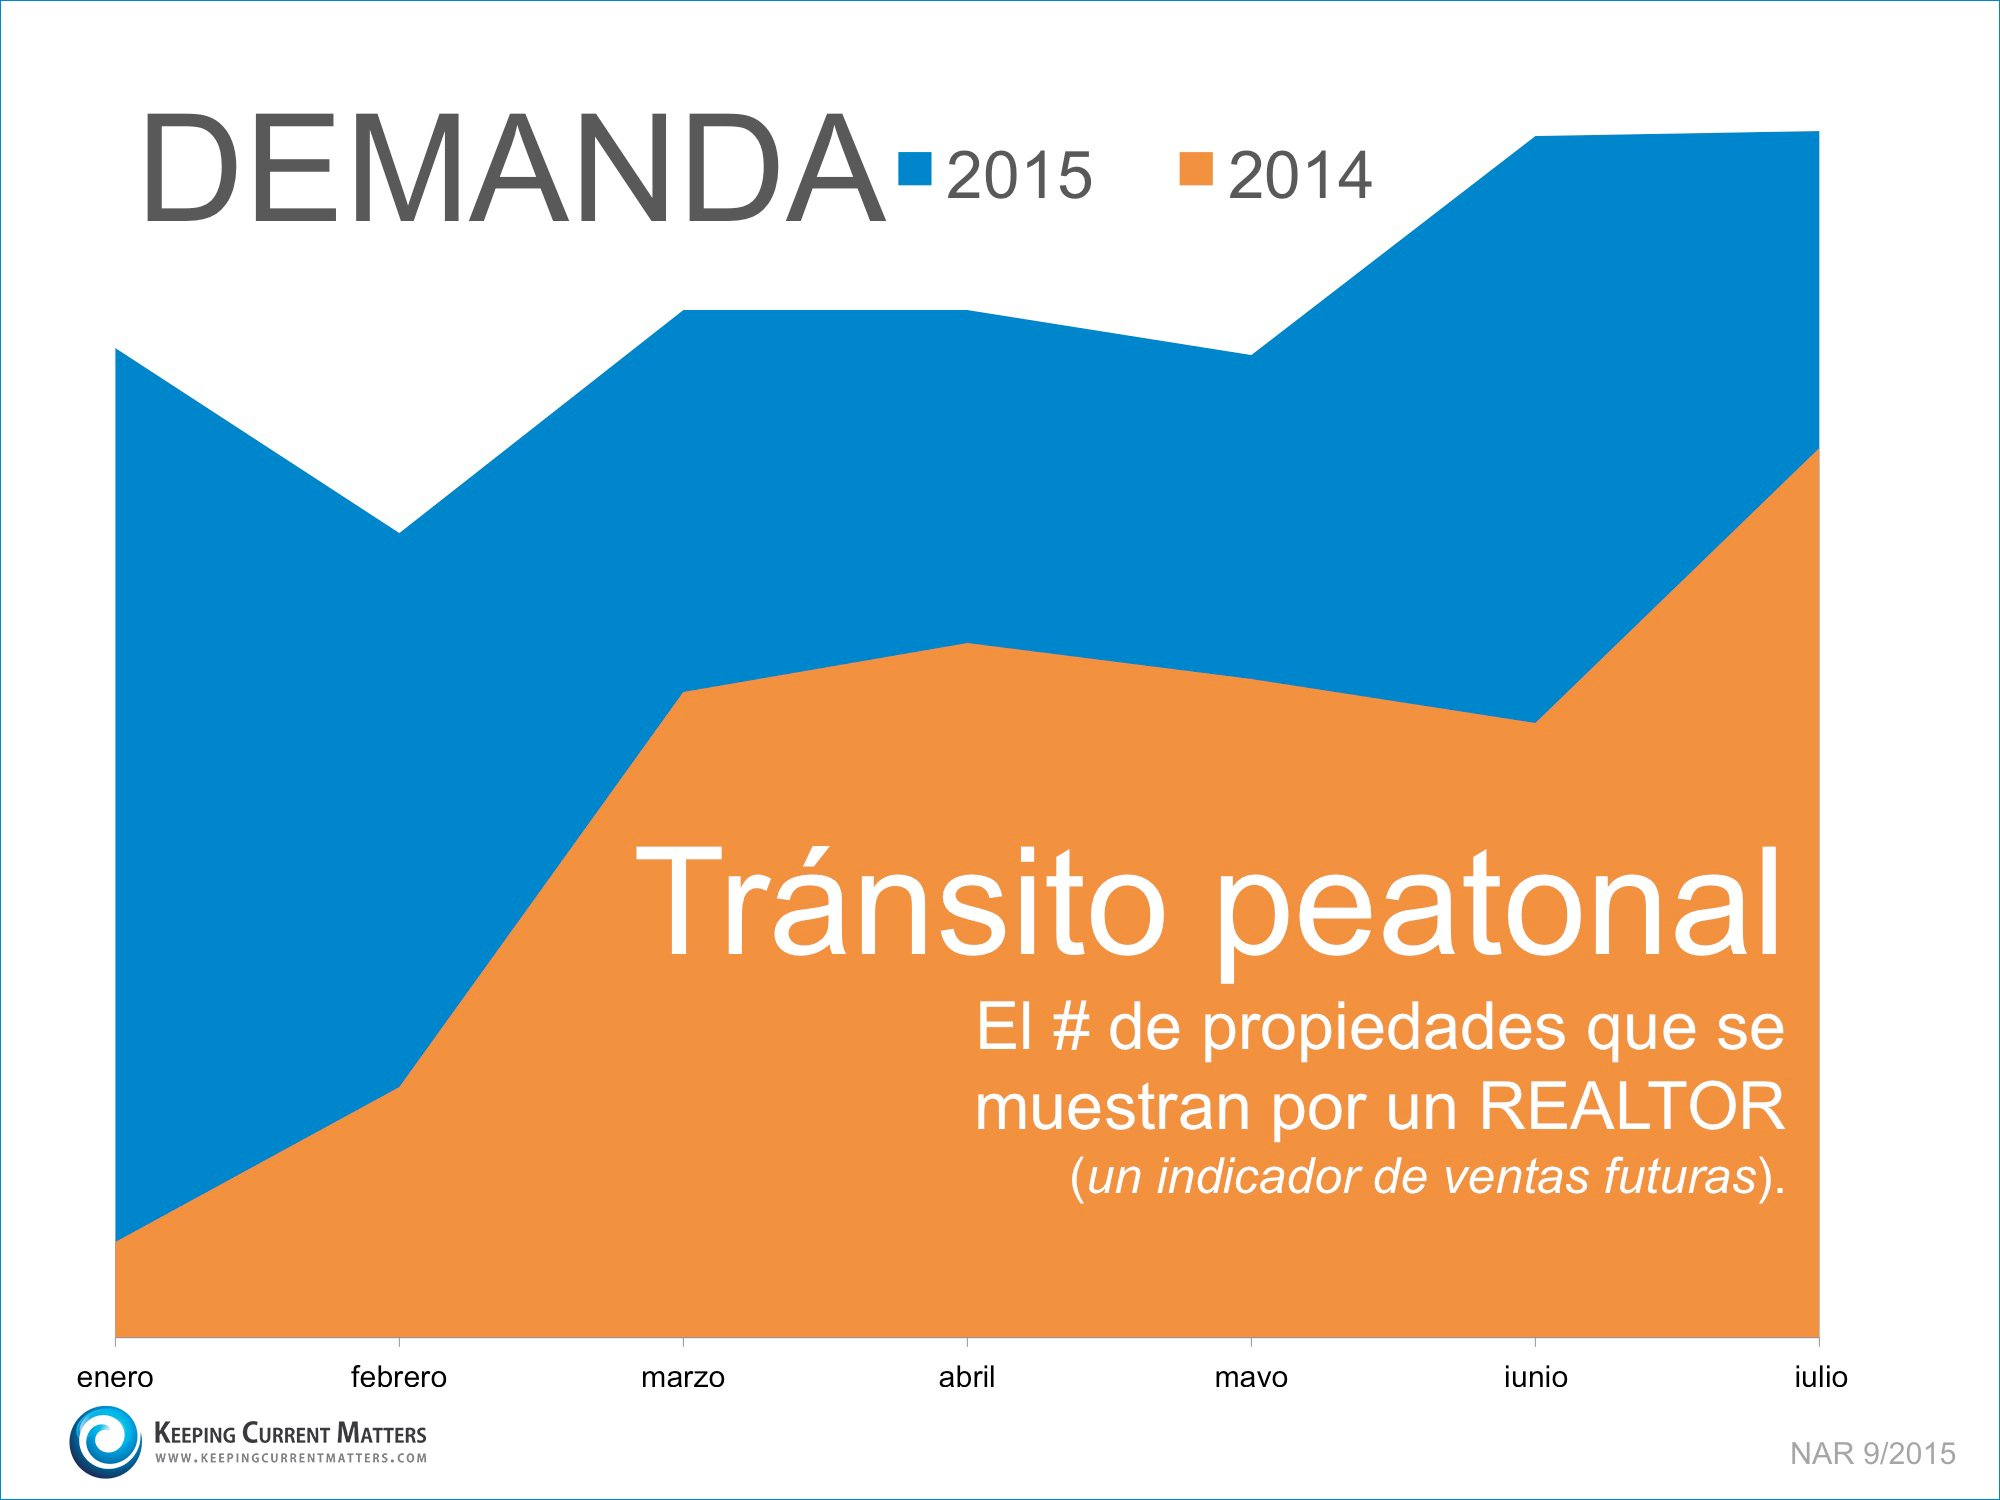 Transito Peatonal | Keeping Current Matters